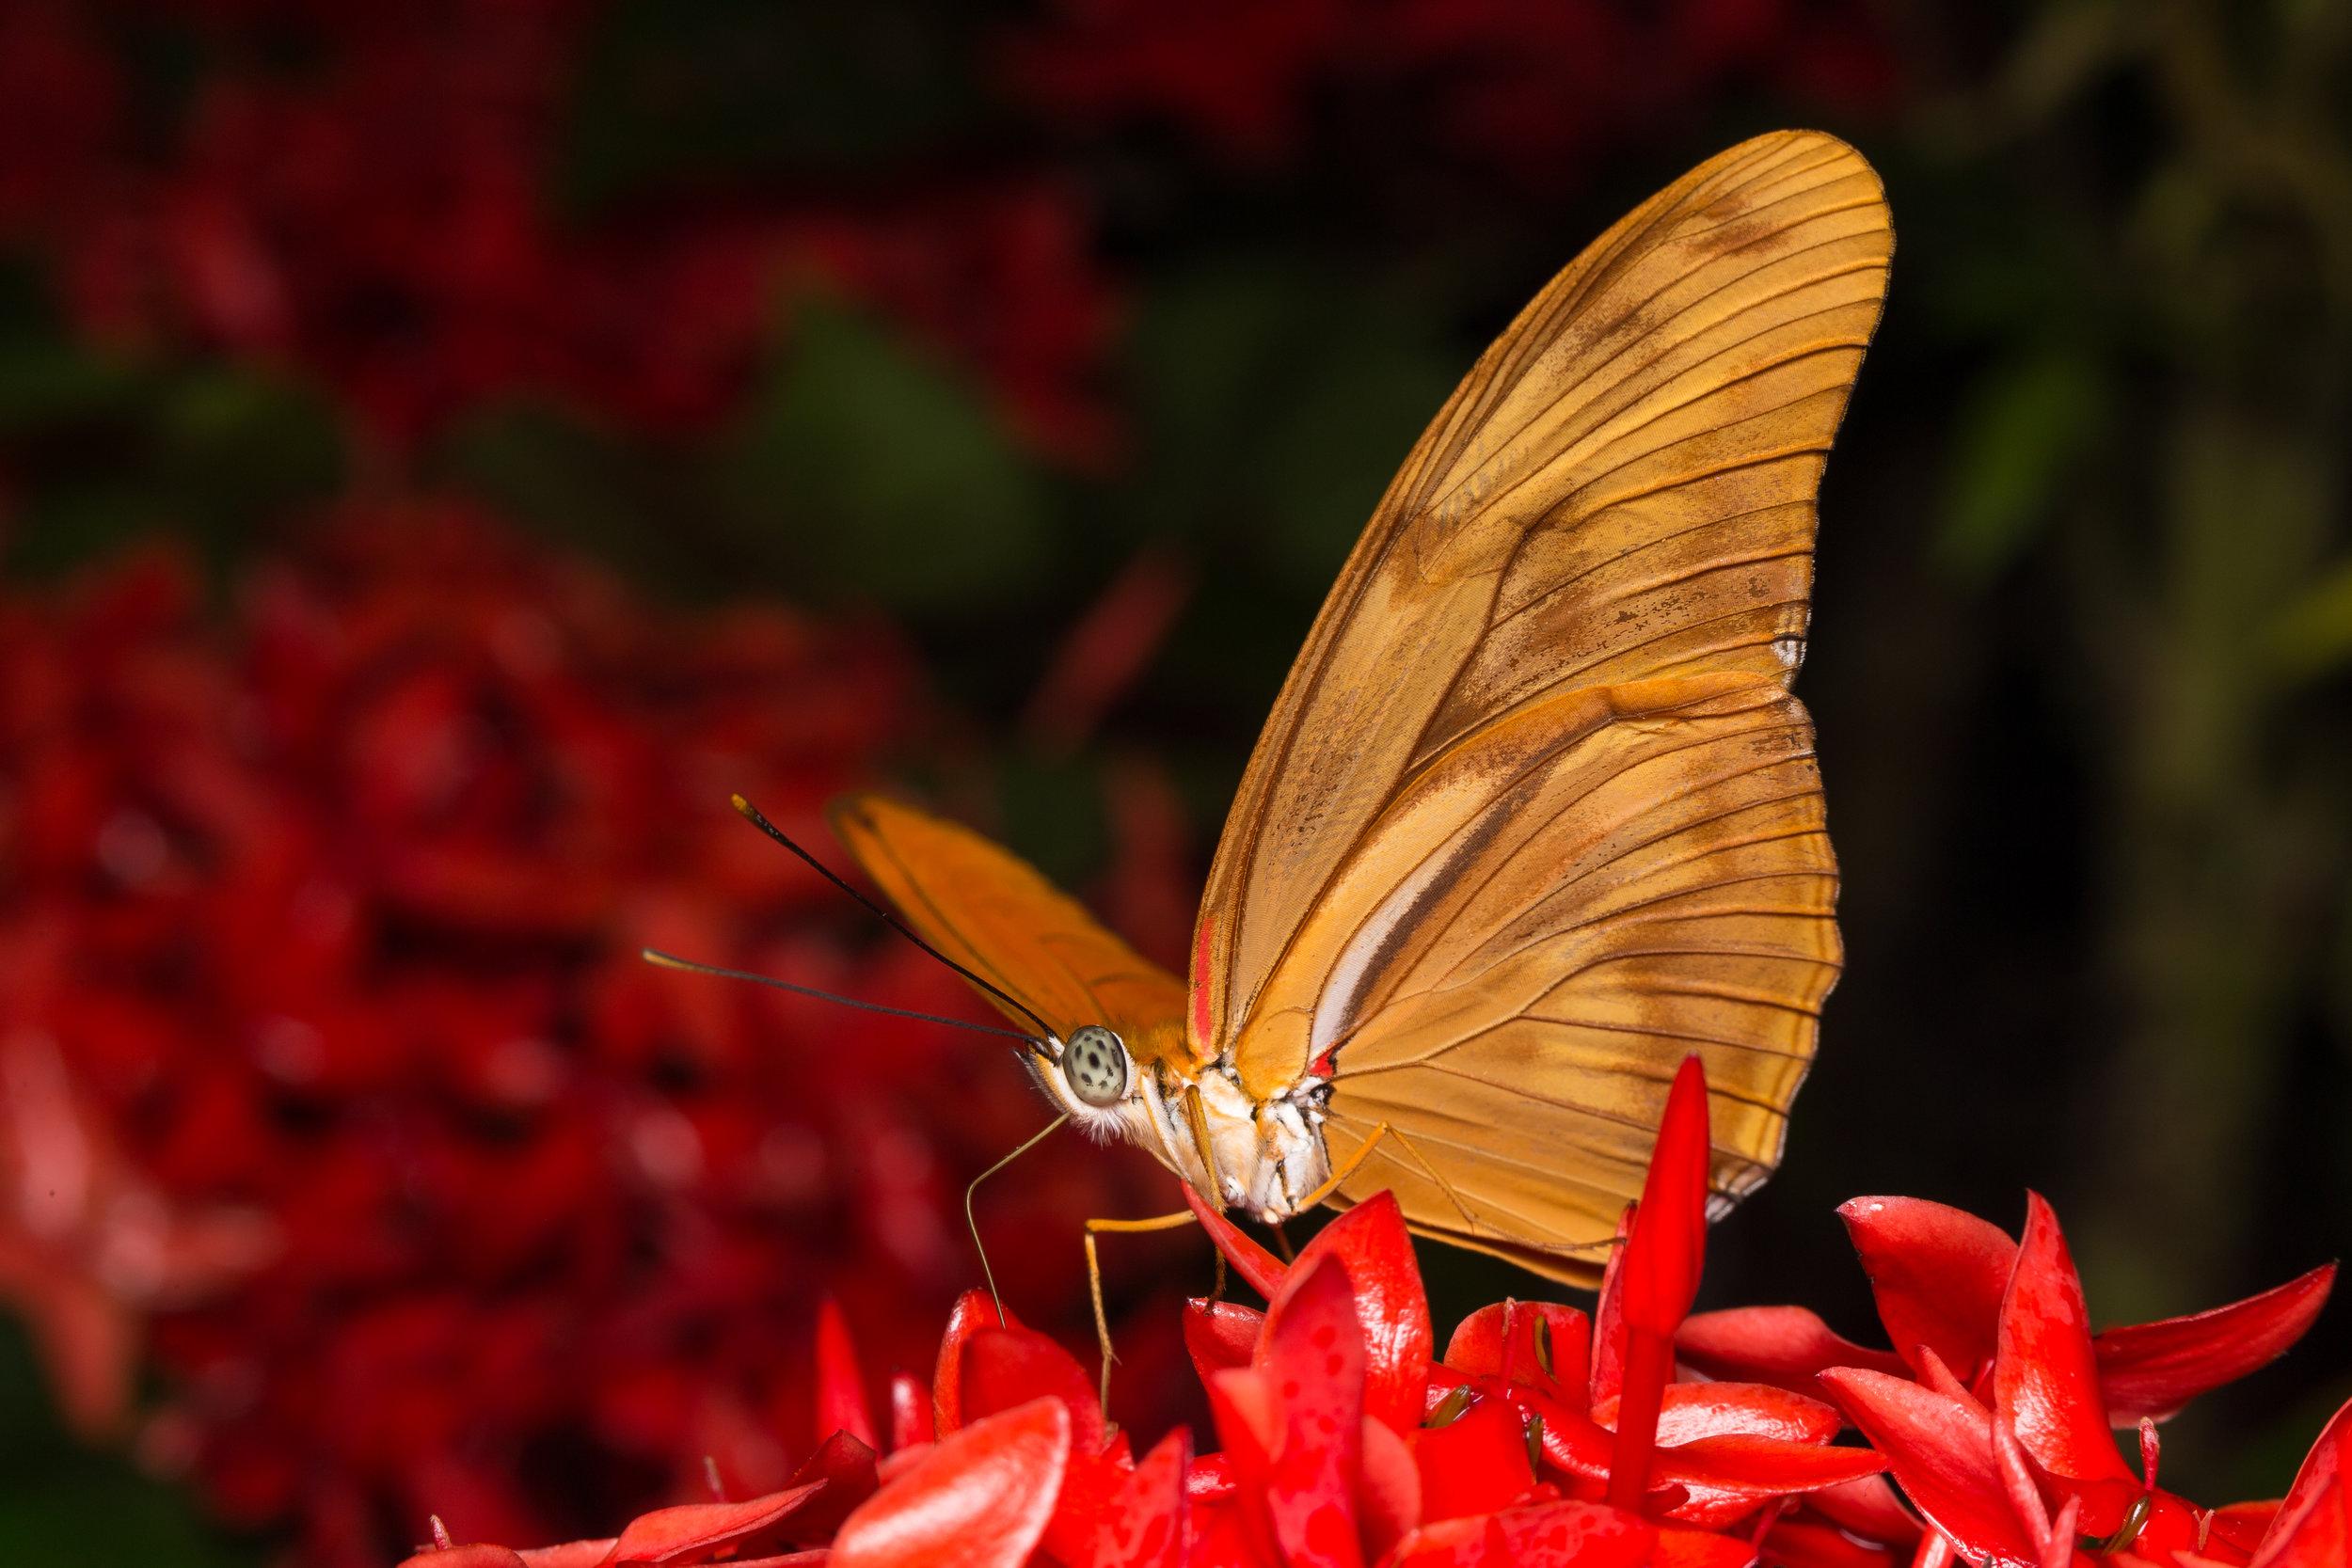 Golden Butterfly Red Flowers.jpg